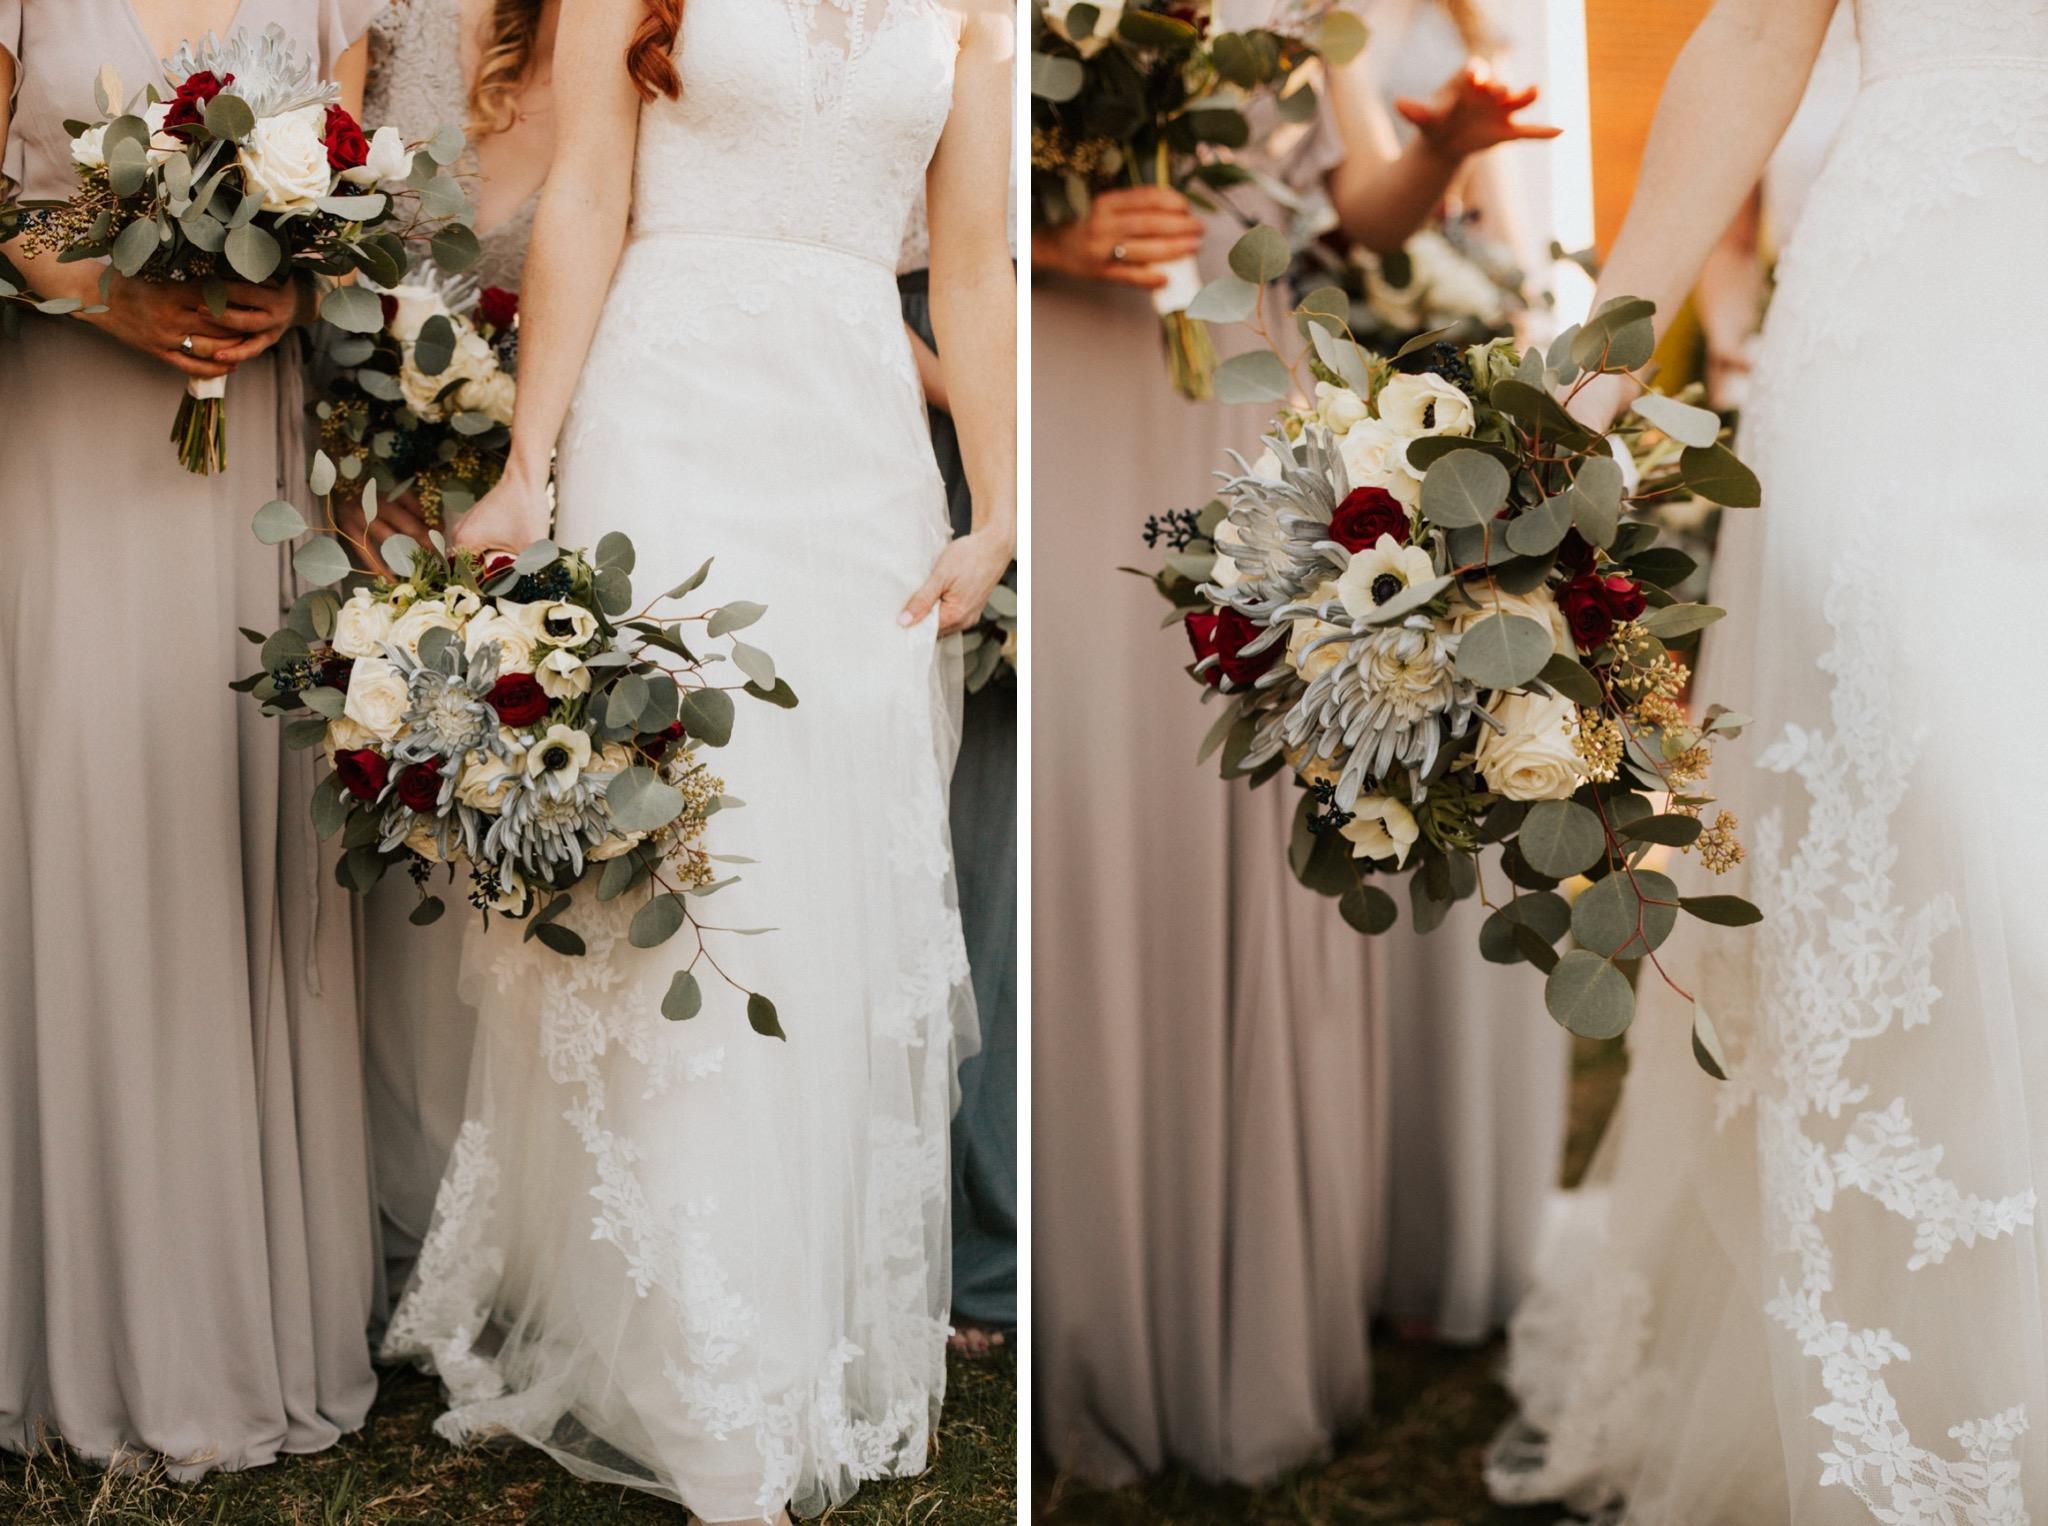 61_West Manor Estate Weddings - Pat Cori Photography-127_West Manor Estate Weddings - Pat Cori Photography-128_VirginiaWeddingPhotographer_bridesmaids_WestManorEstate_Portraits_Wedding.jpg